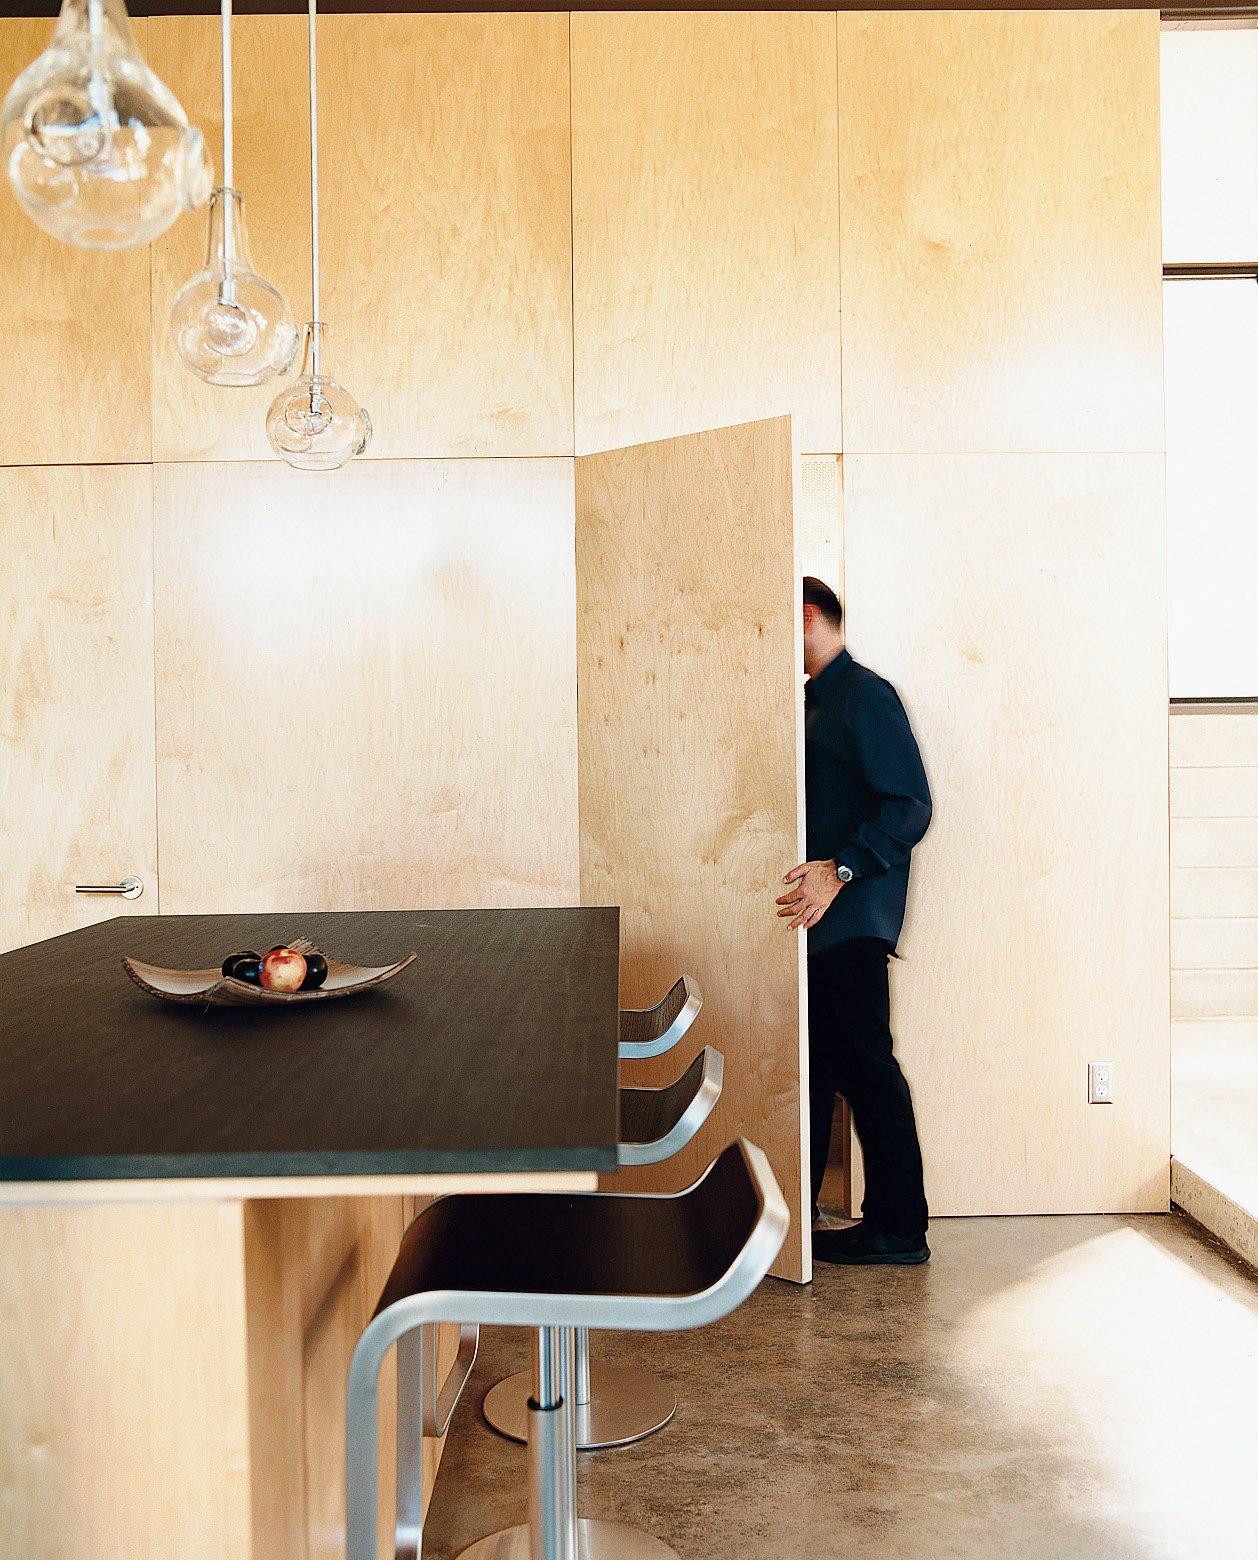 #storage #cabinetry #kitchen #dining #door #minimal #modern #interior #lighting #counter #stools #1960s #SantaMonica #California #GlennResidence #RayKappe  60+ Modern Lighting Solutions by Dwell